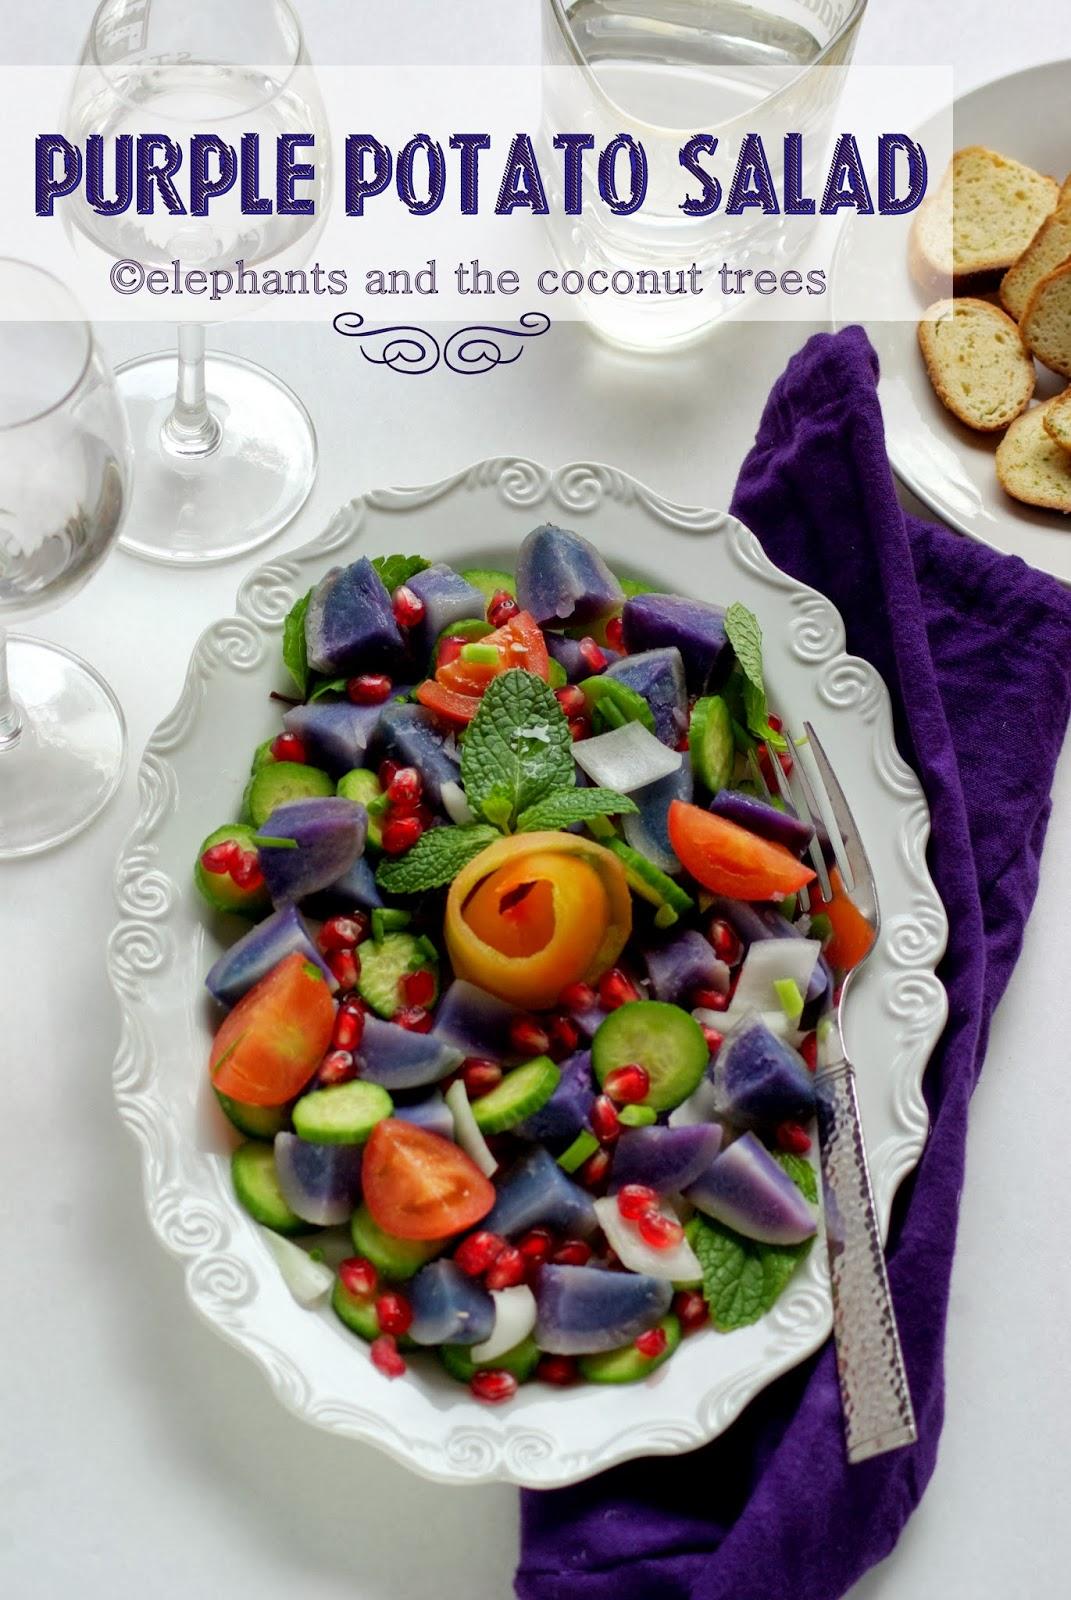 ... and the coconut trees: Purple Potato Salad with Grapefruit Vinaigrette